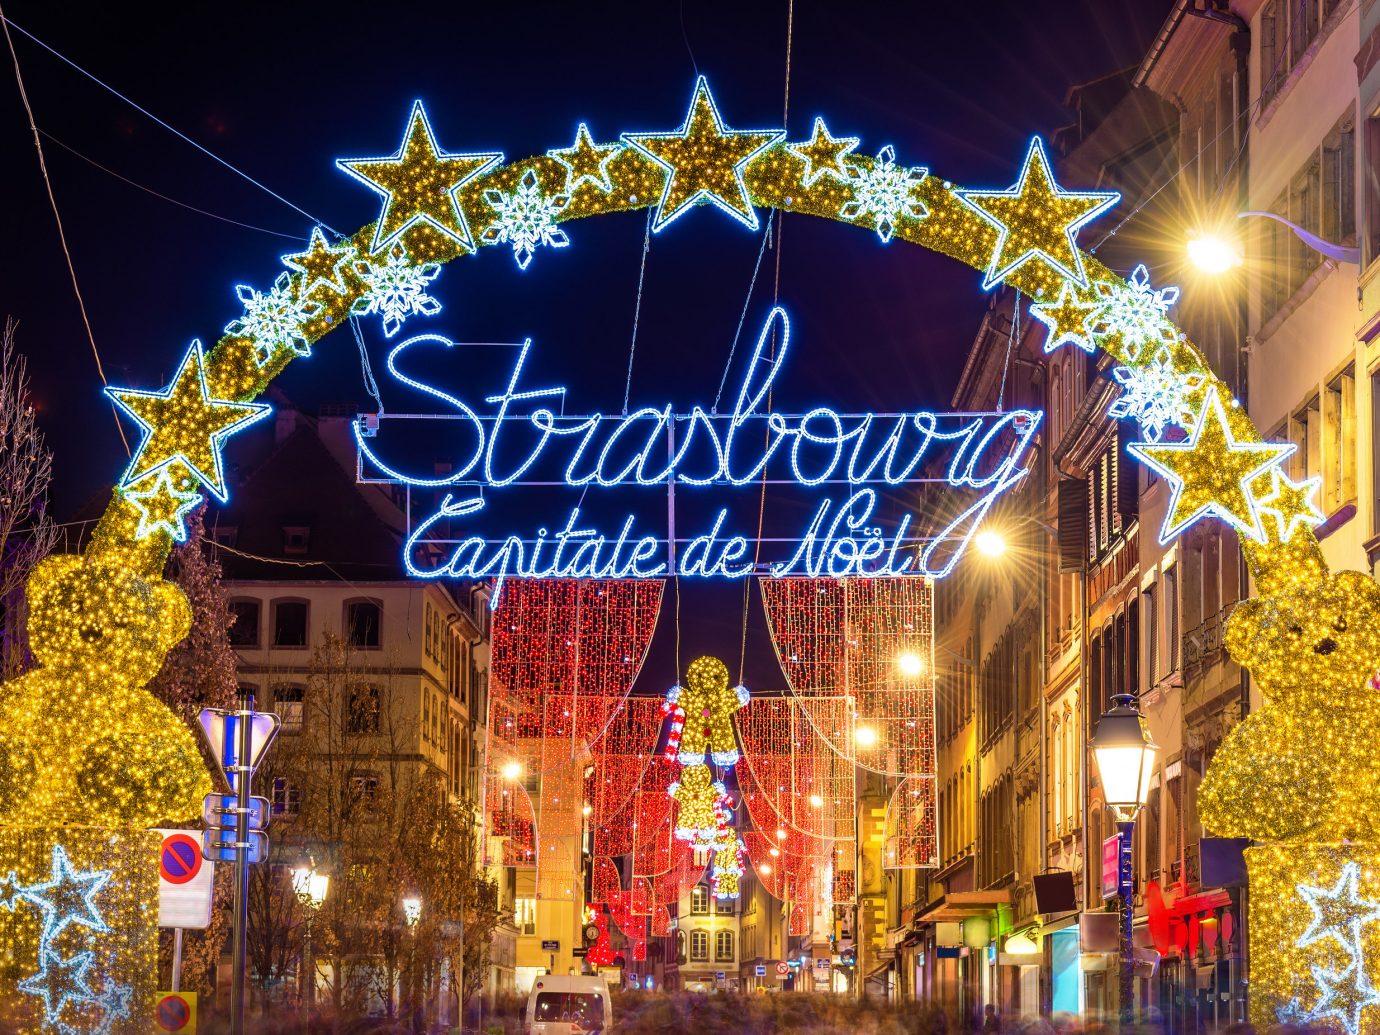 Cruise Travel Luxury Travel Trip Ideas building outdoor street City christmas lights christmas decoration night Christmas light holiday crowd